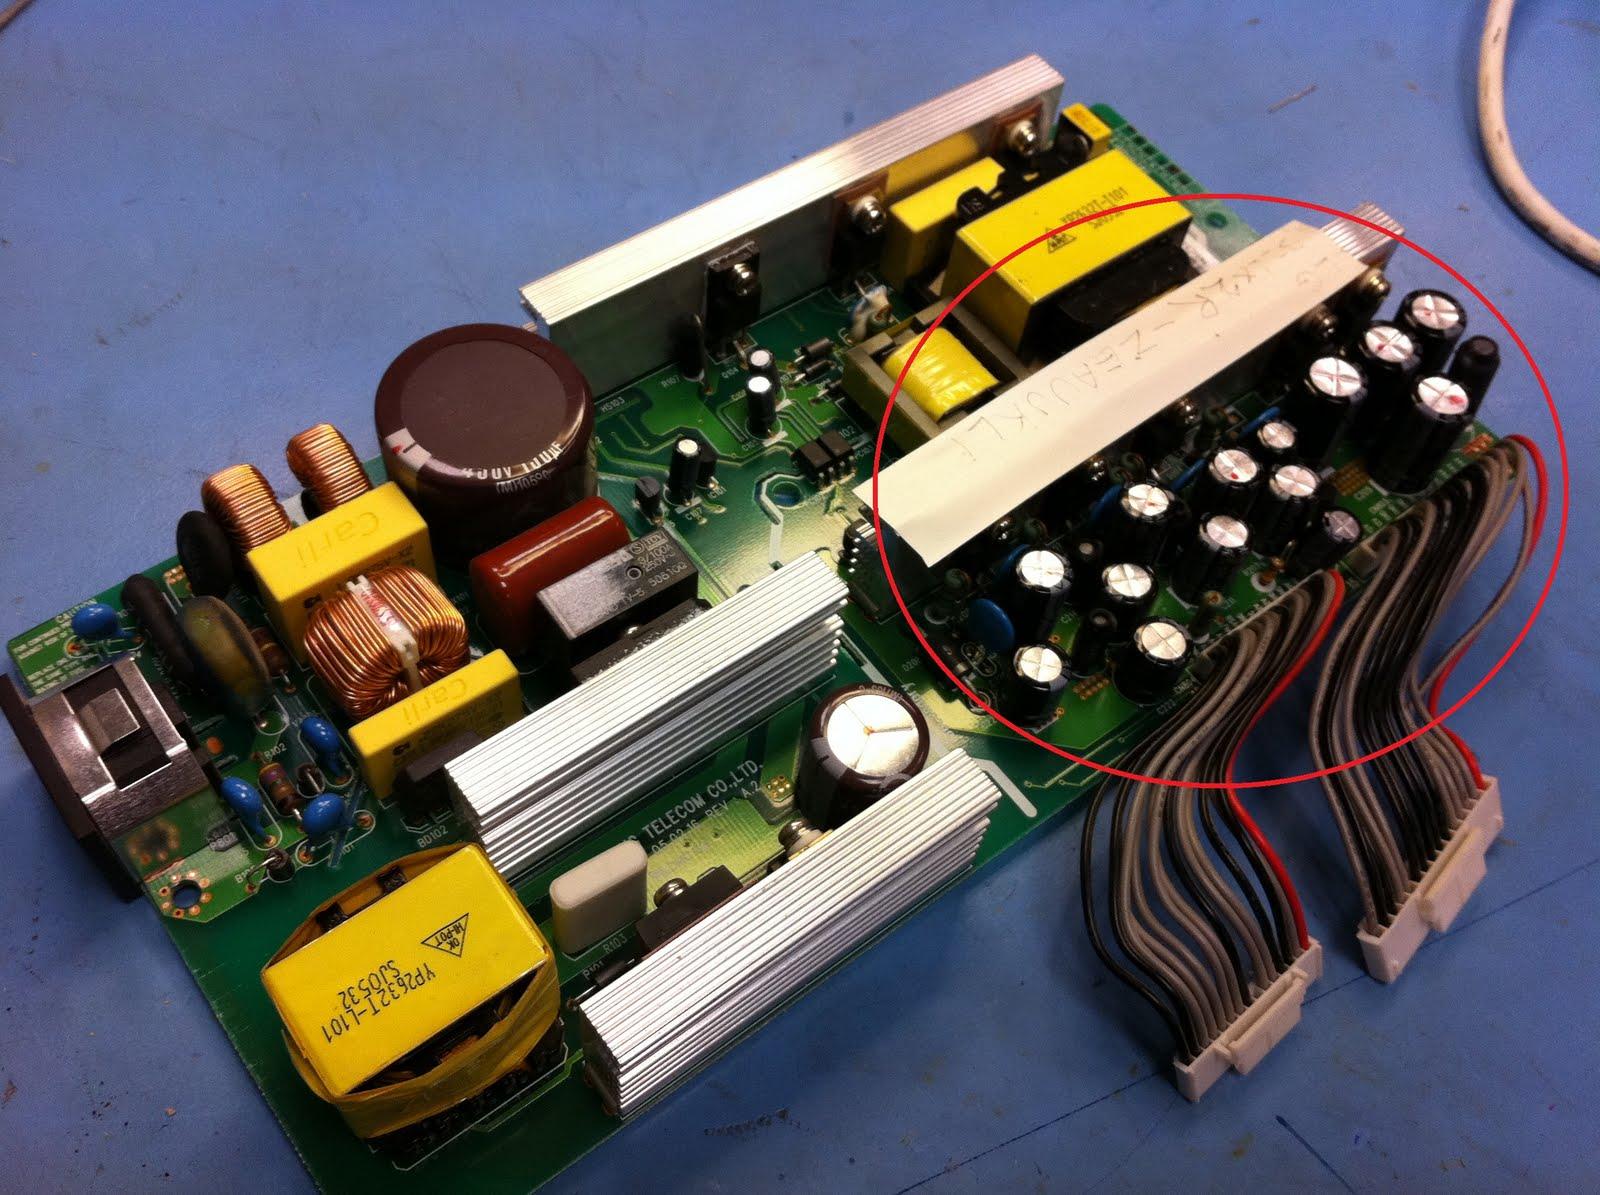 The Repair Blog: LG 32LX2R Faulty power supply